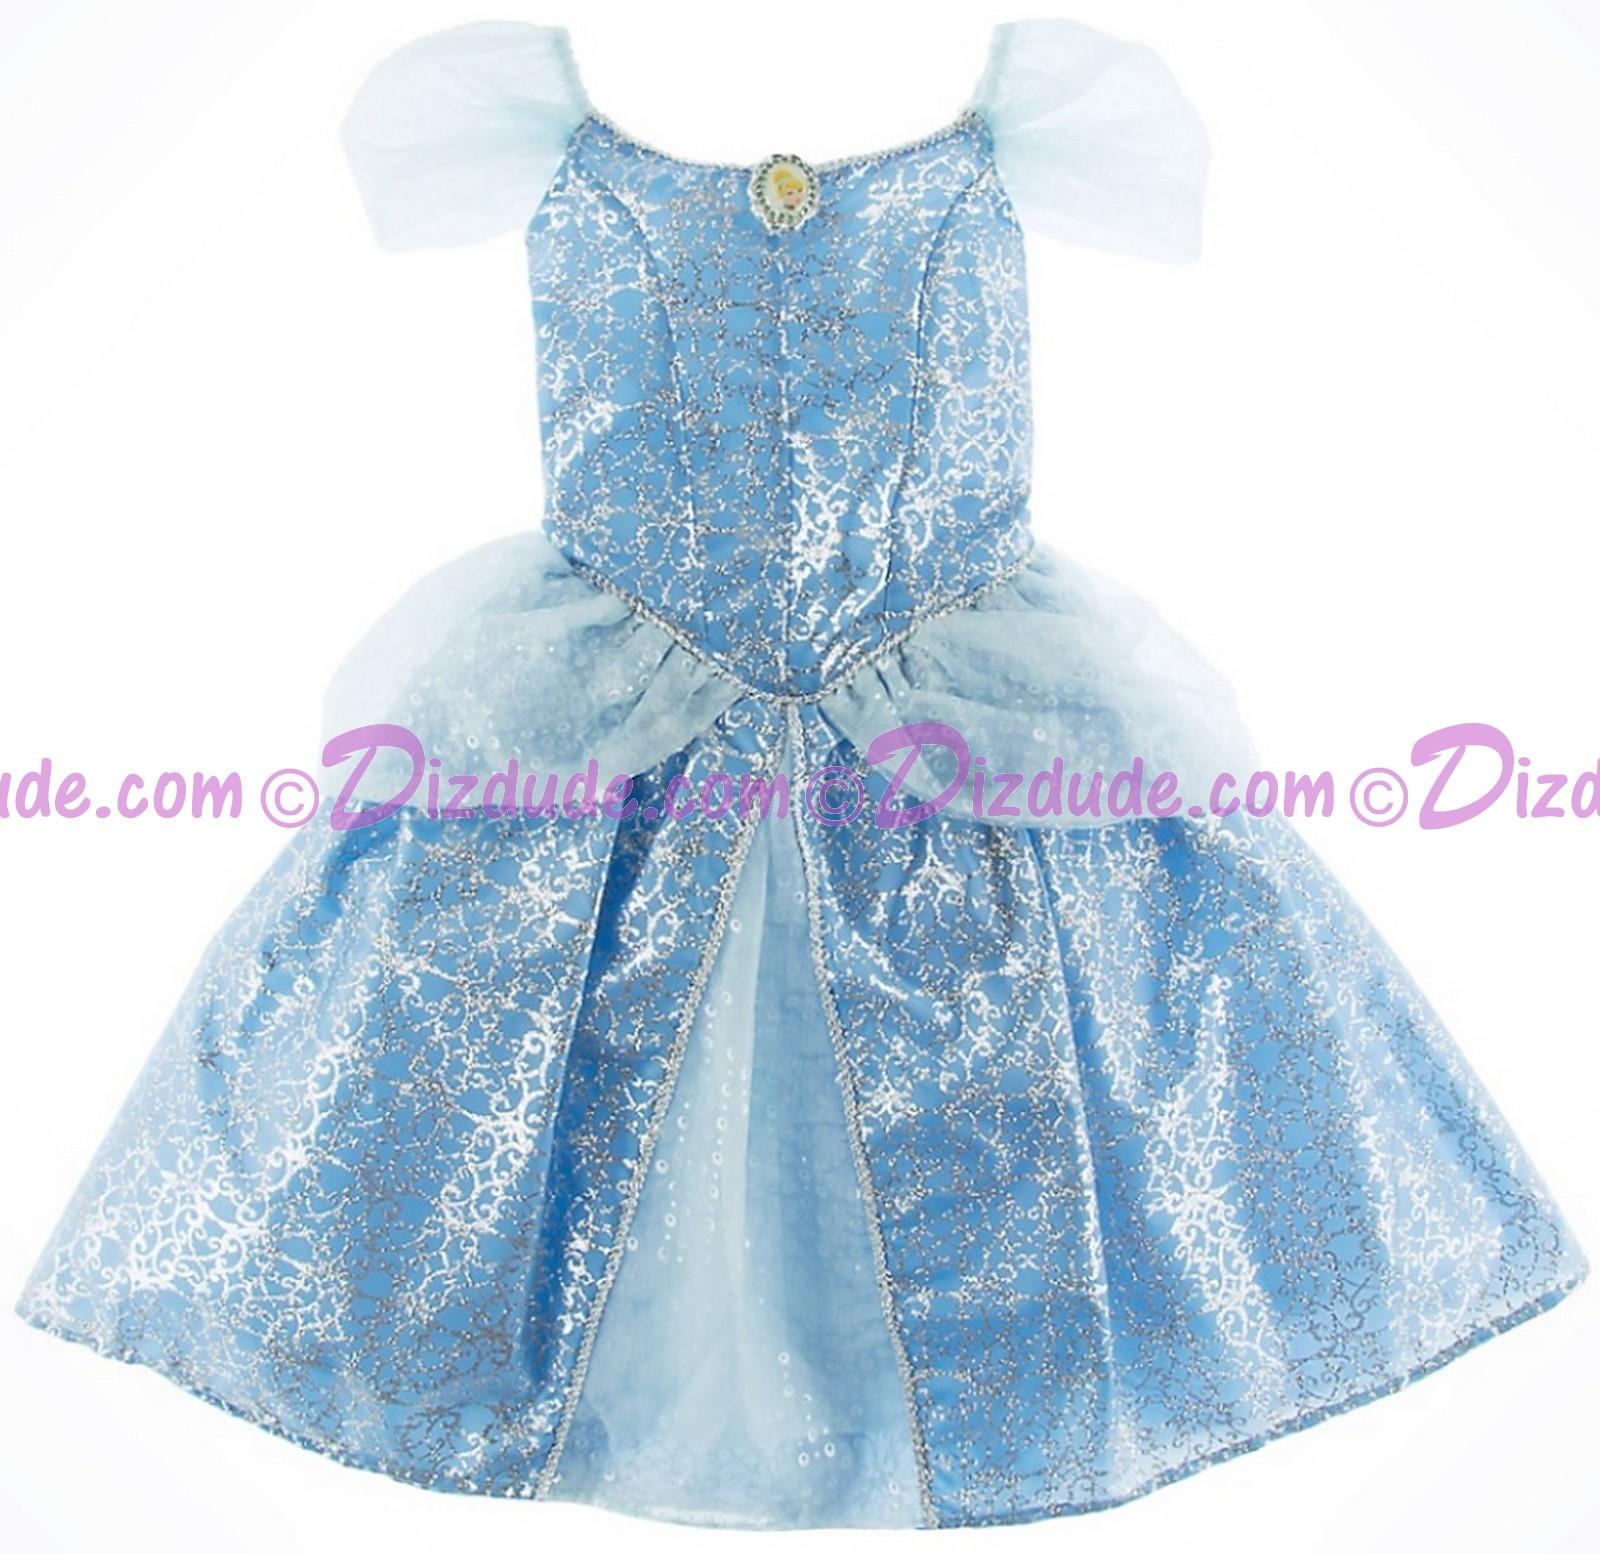 Disney Friendship Dress Cinderella: Disney Theme Park Princess Cinderella Dress